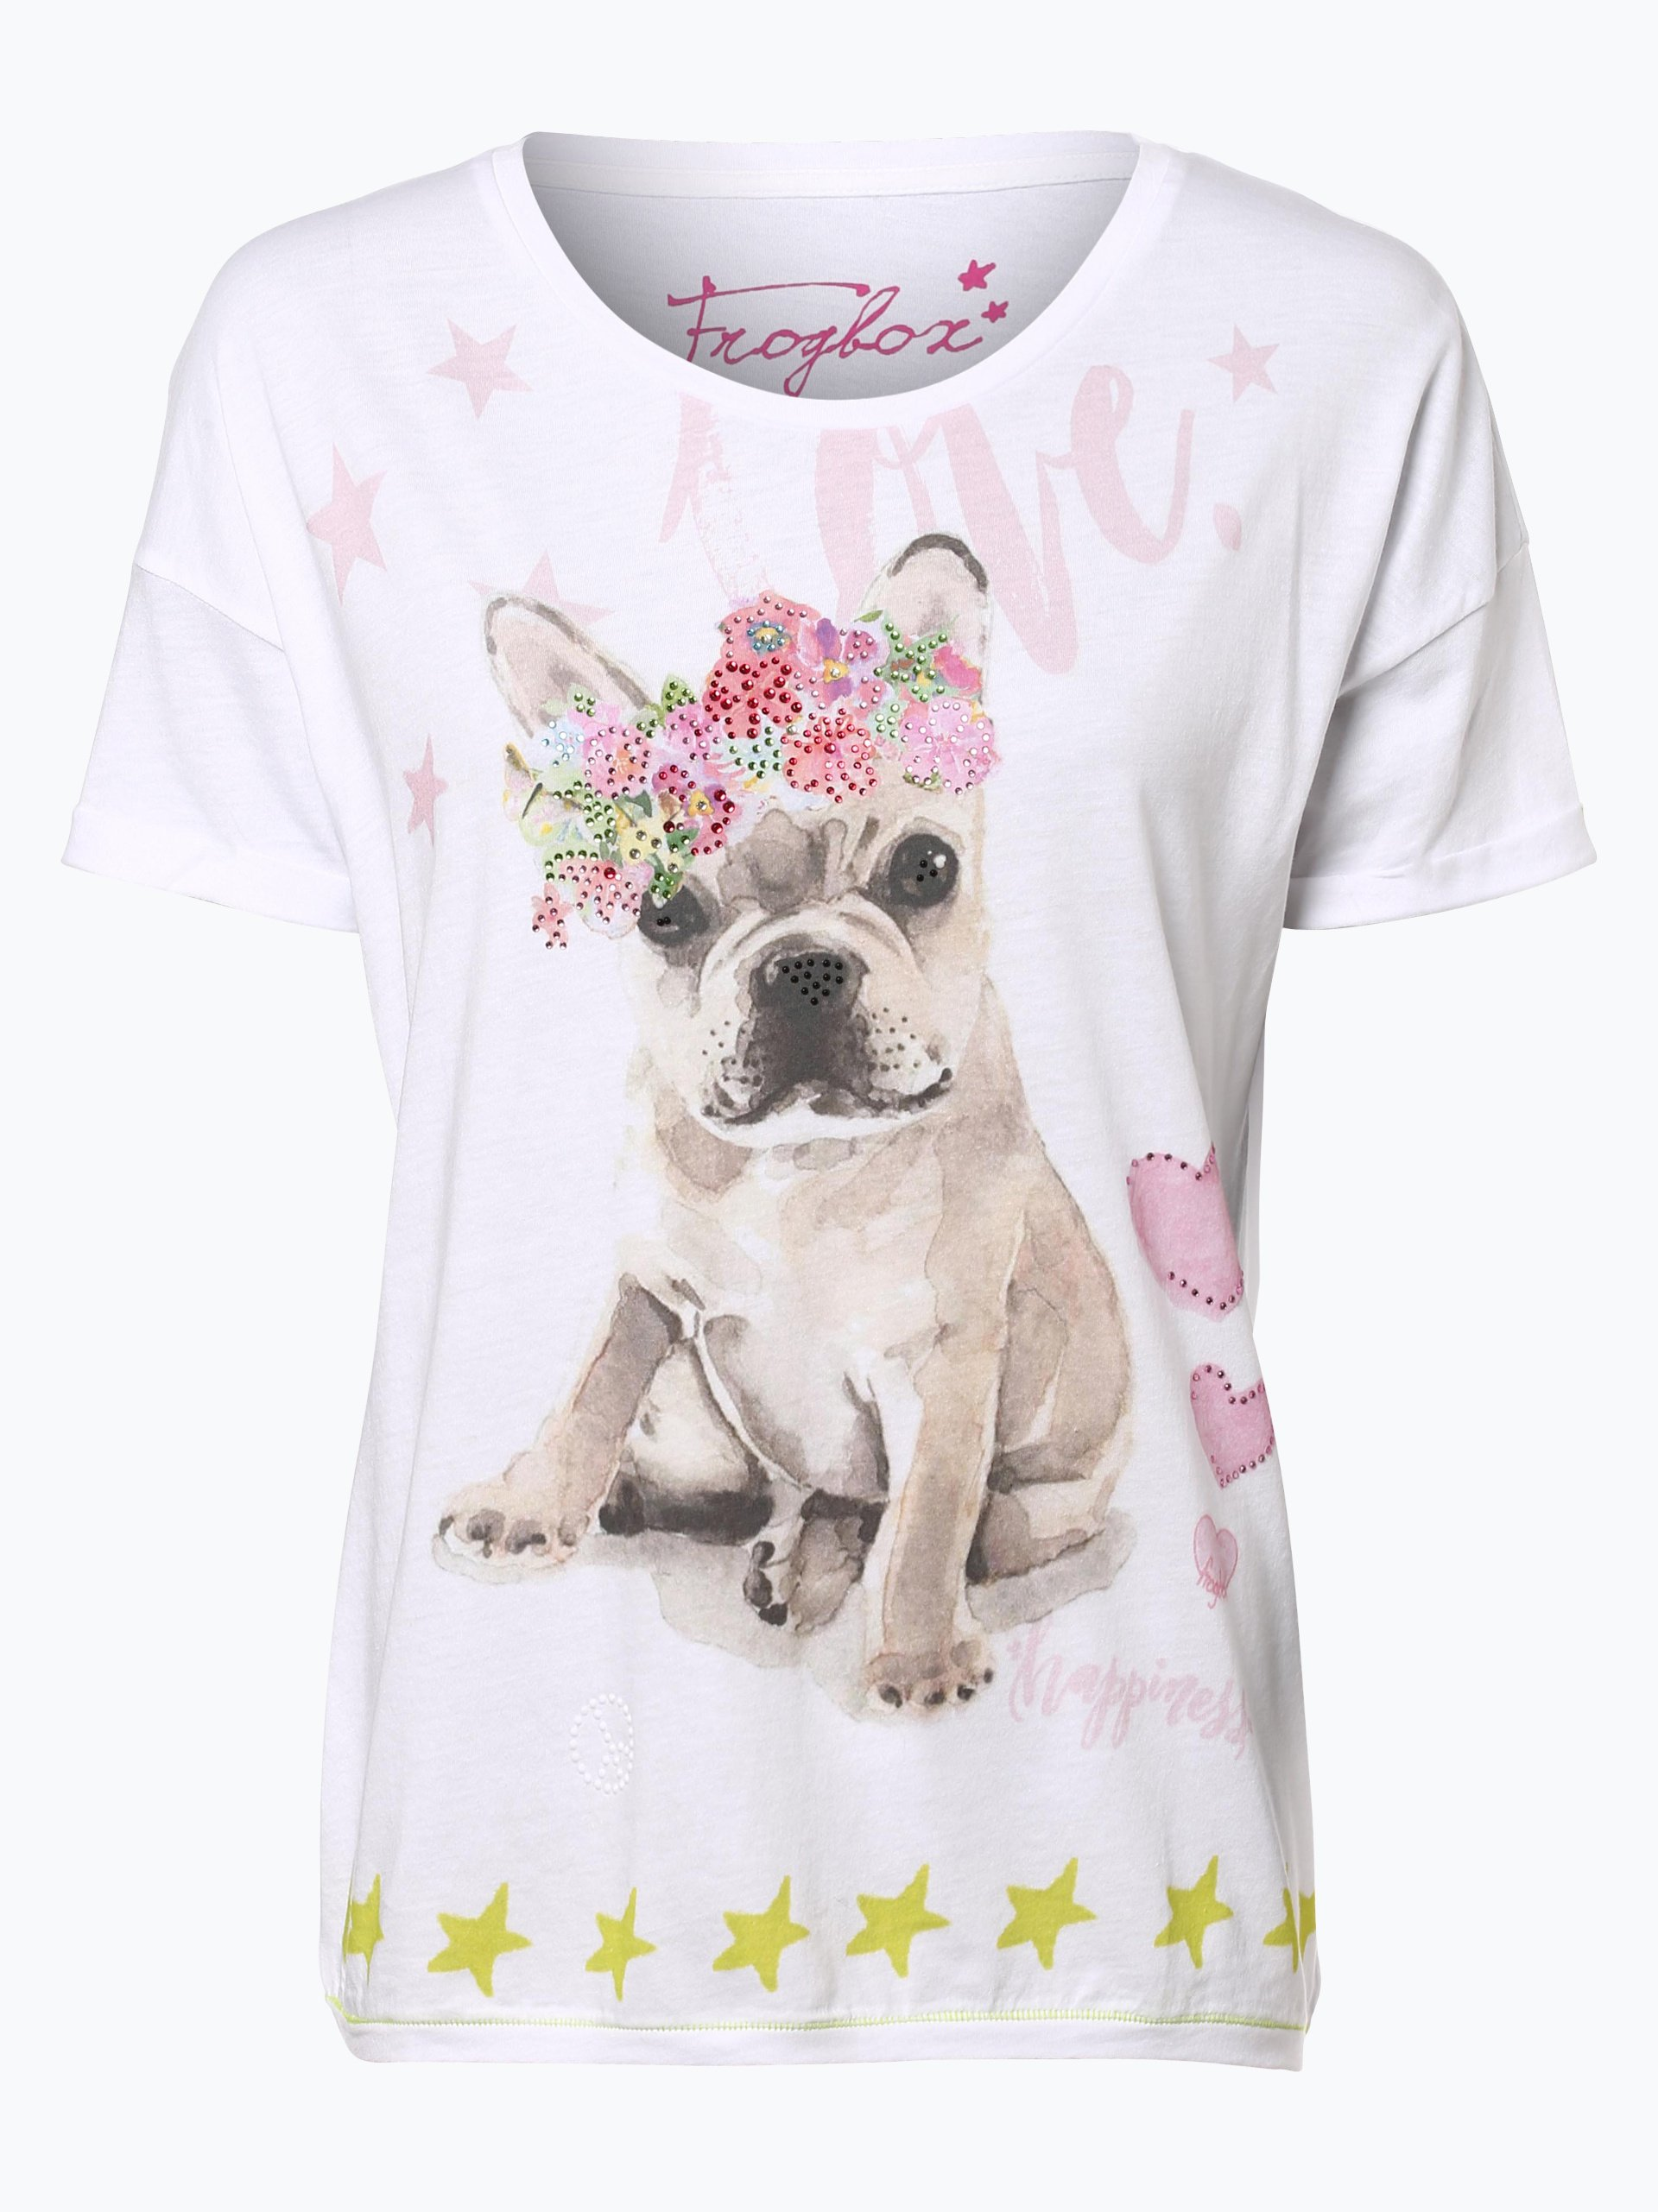 Frogbox T-shirt damski